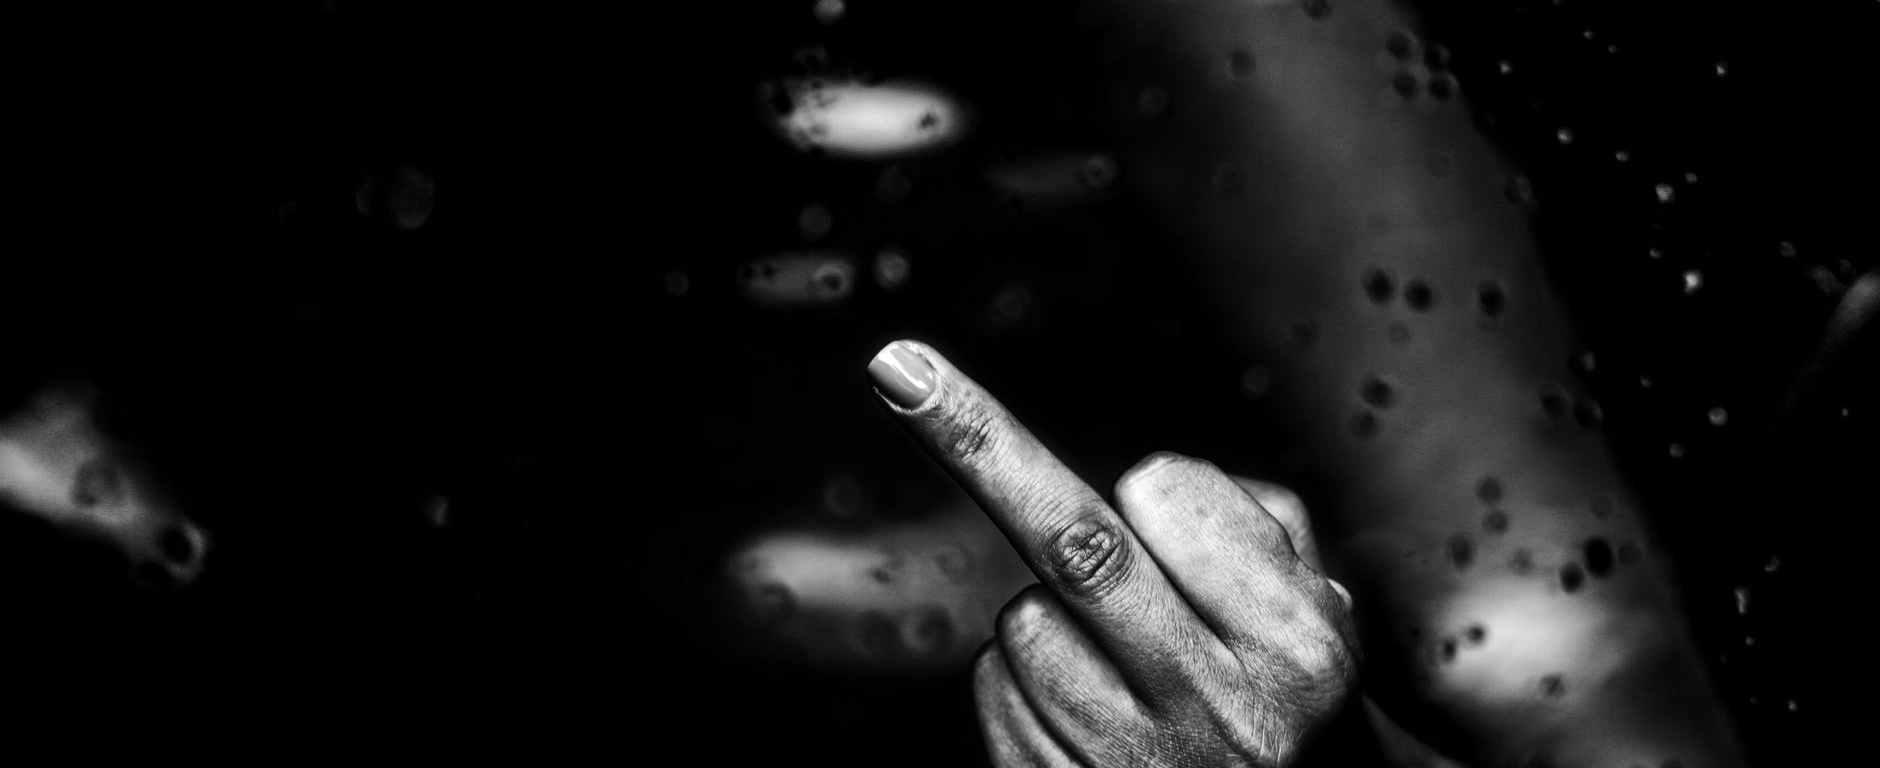 faceless black person demonstrating middle finger